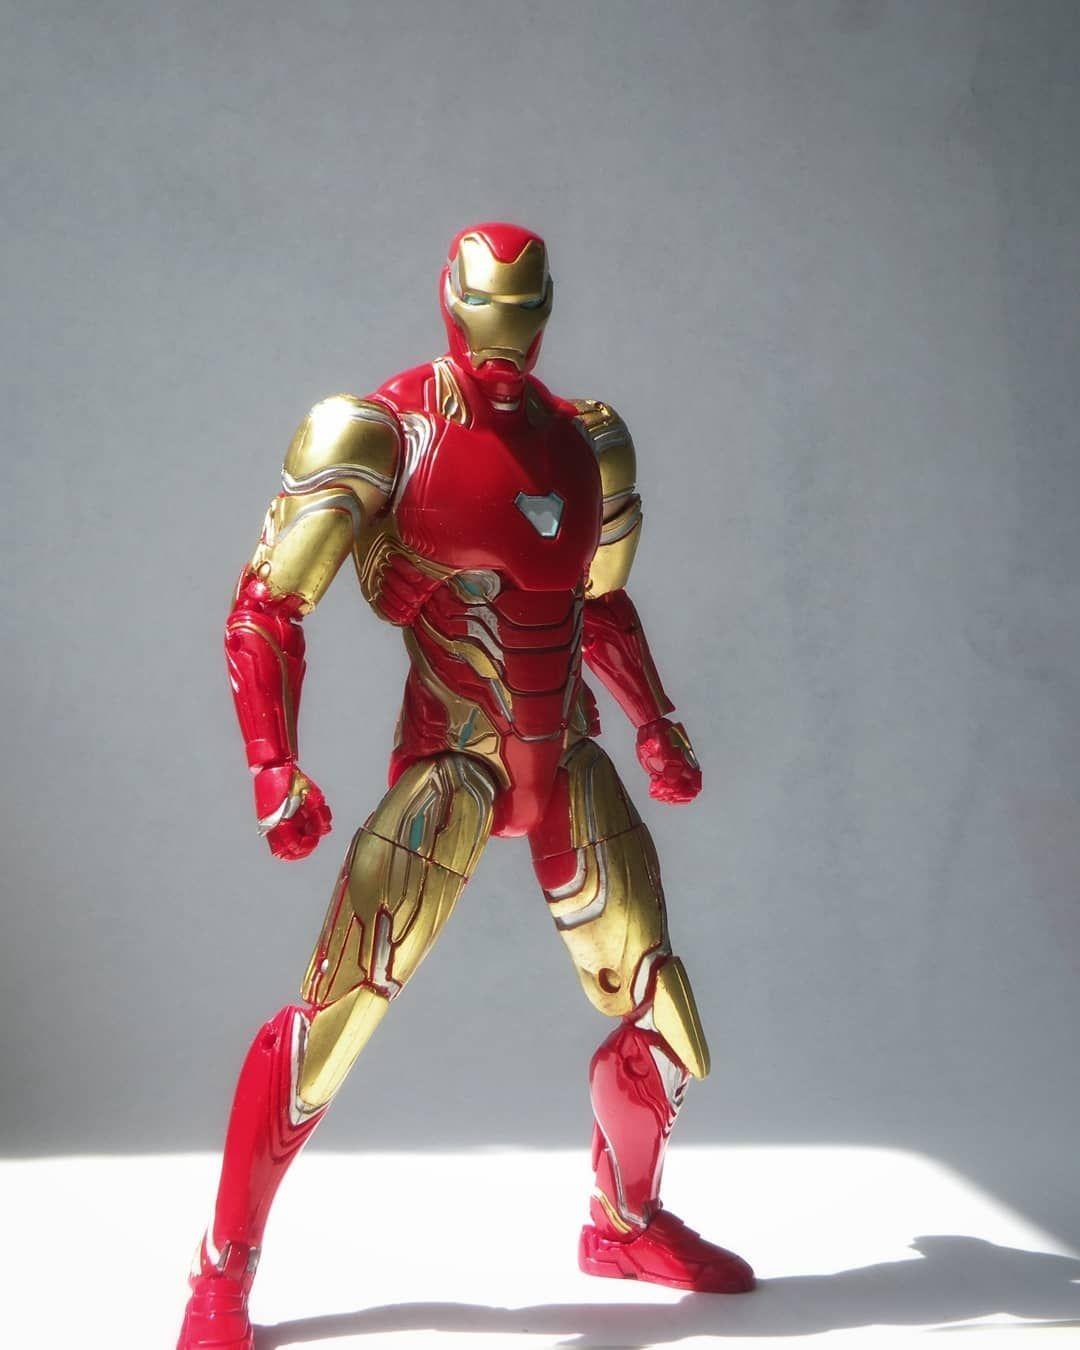 Custom Avengers Iron Man Mark 85 Model Toy Iron Man Tattoo Iron Man Poster Iron Man Funny